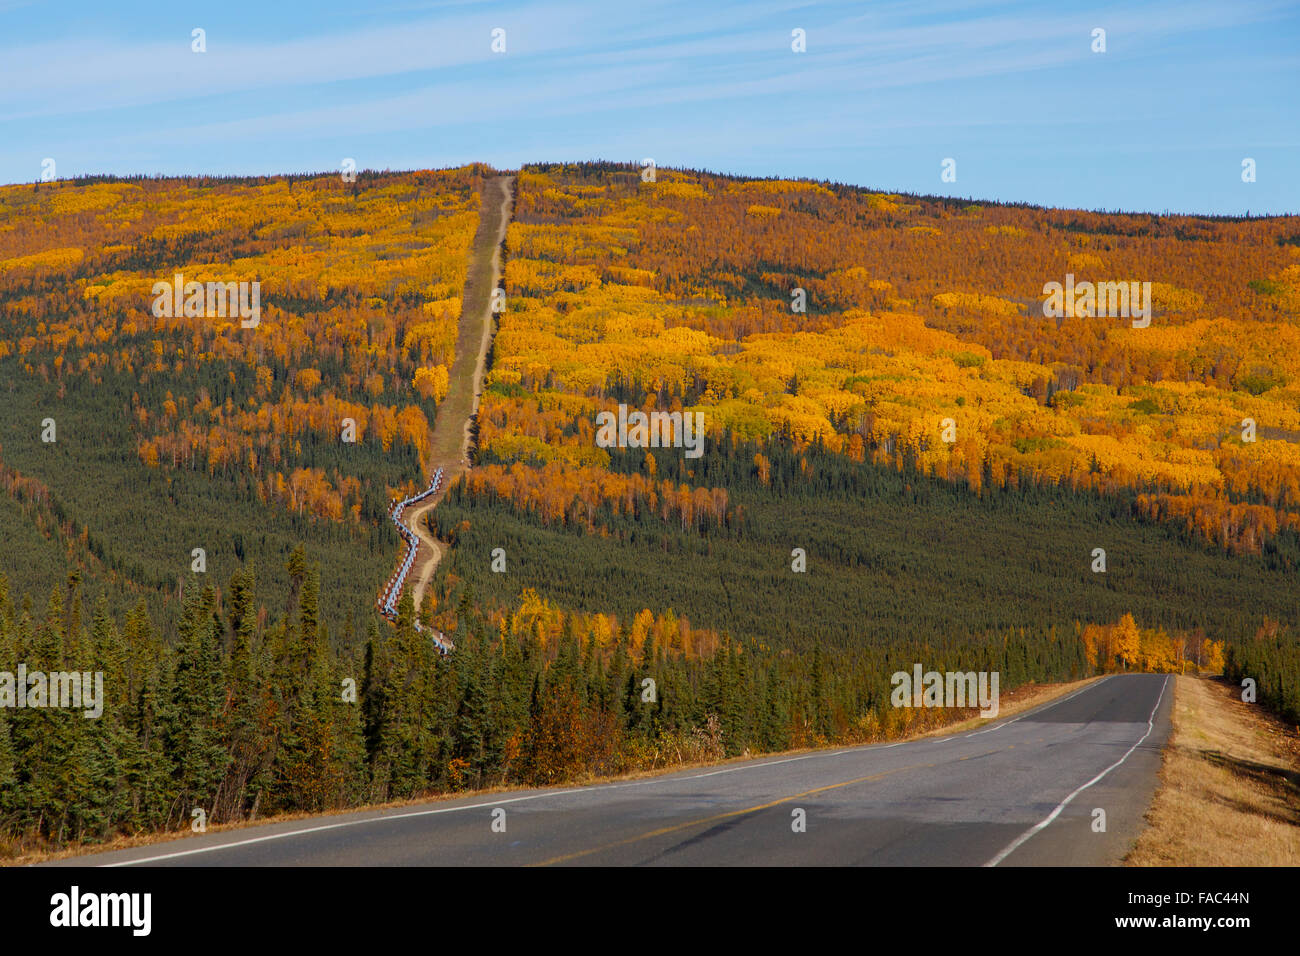 Alyeska Pipeline along the Dalton Highway, Alaska. - Stock Image